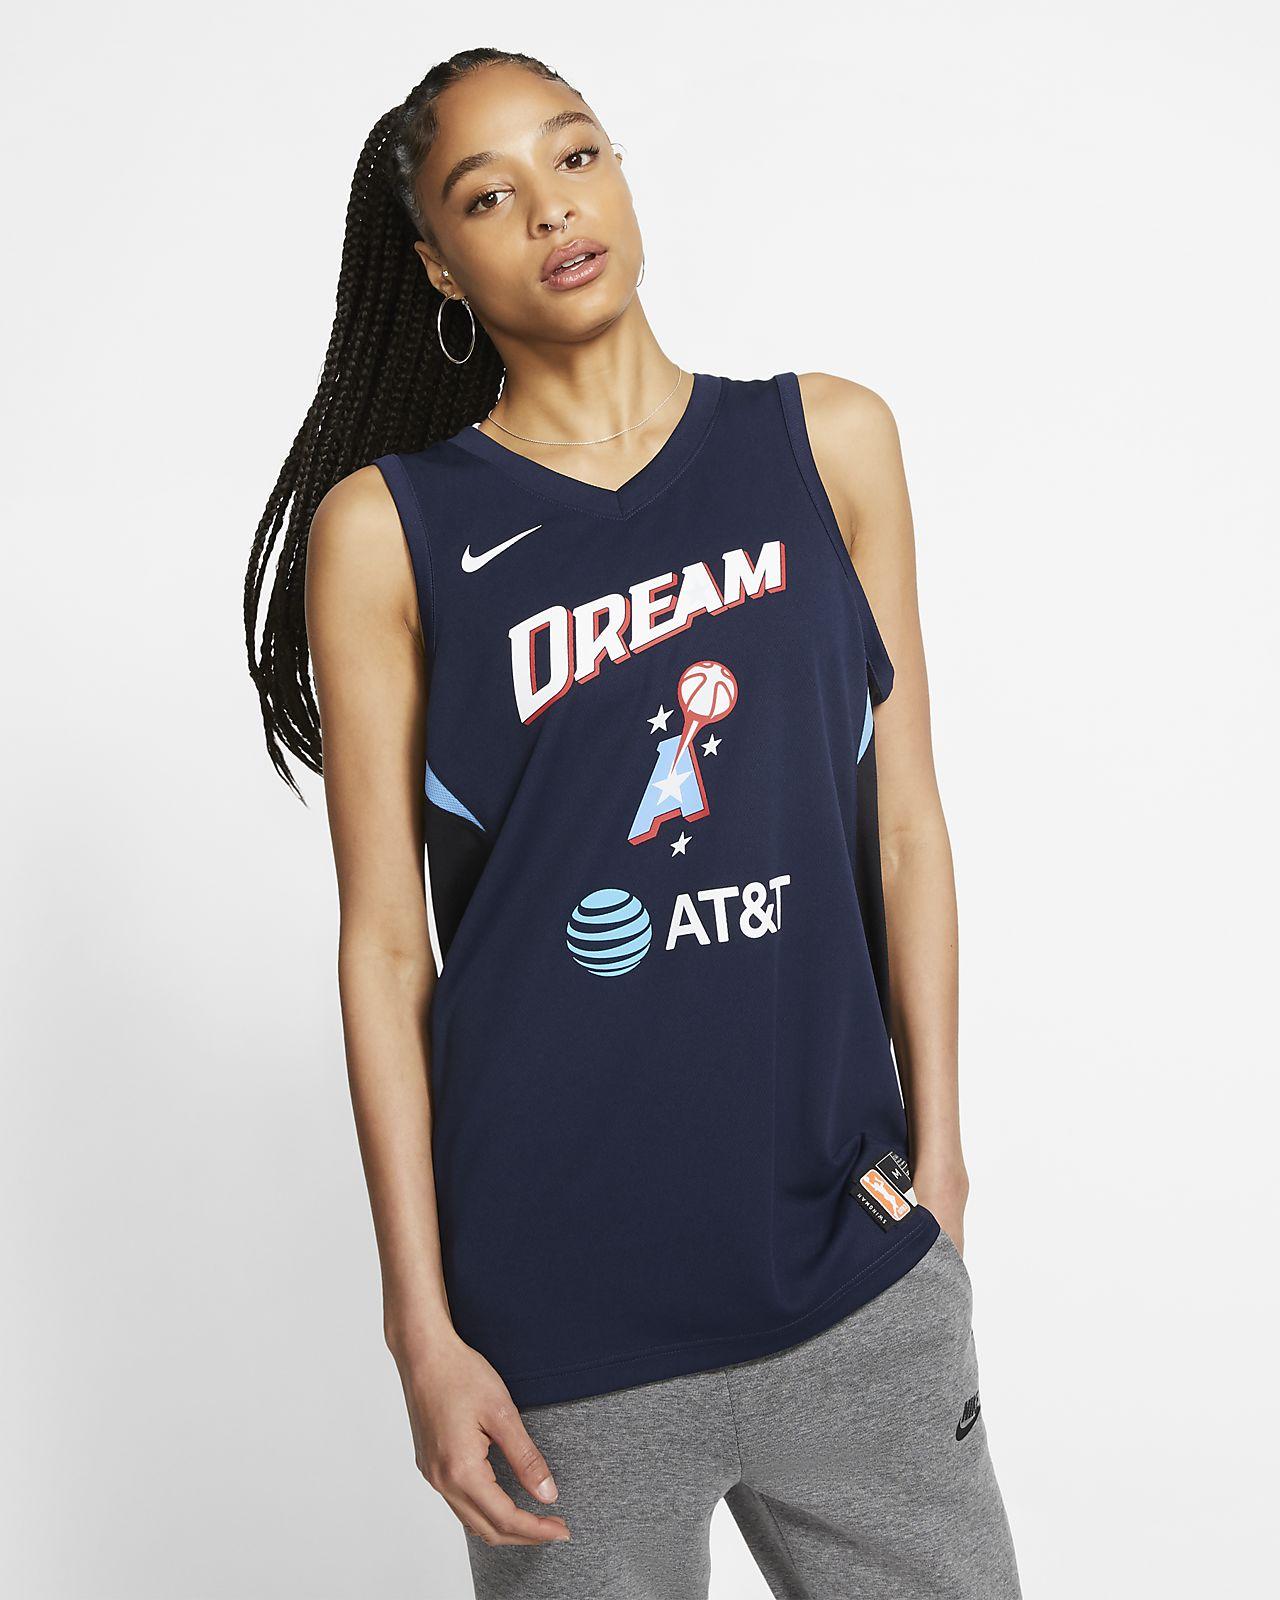 Tiffany Hayes Atlanta Dream Nike WNBA Basketball Jersey